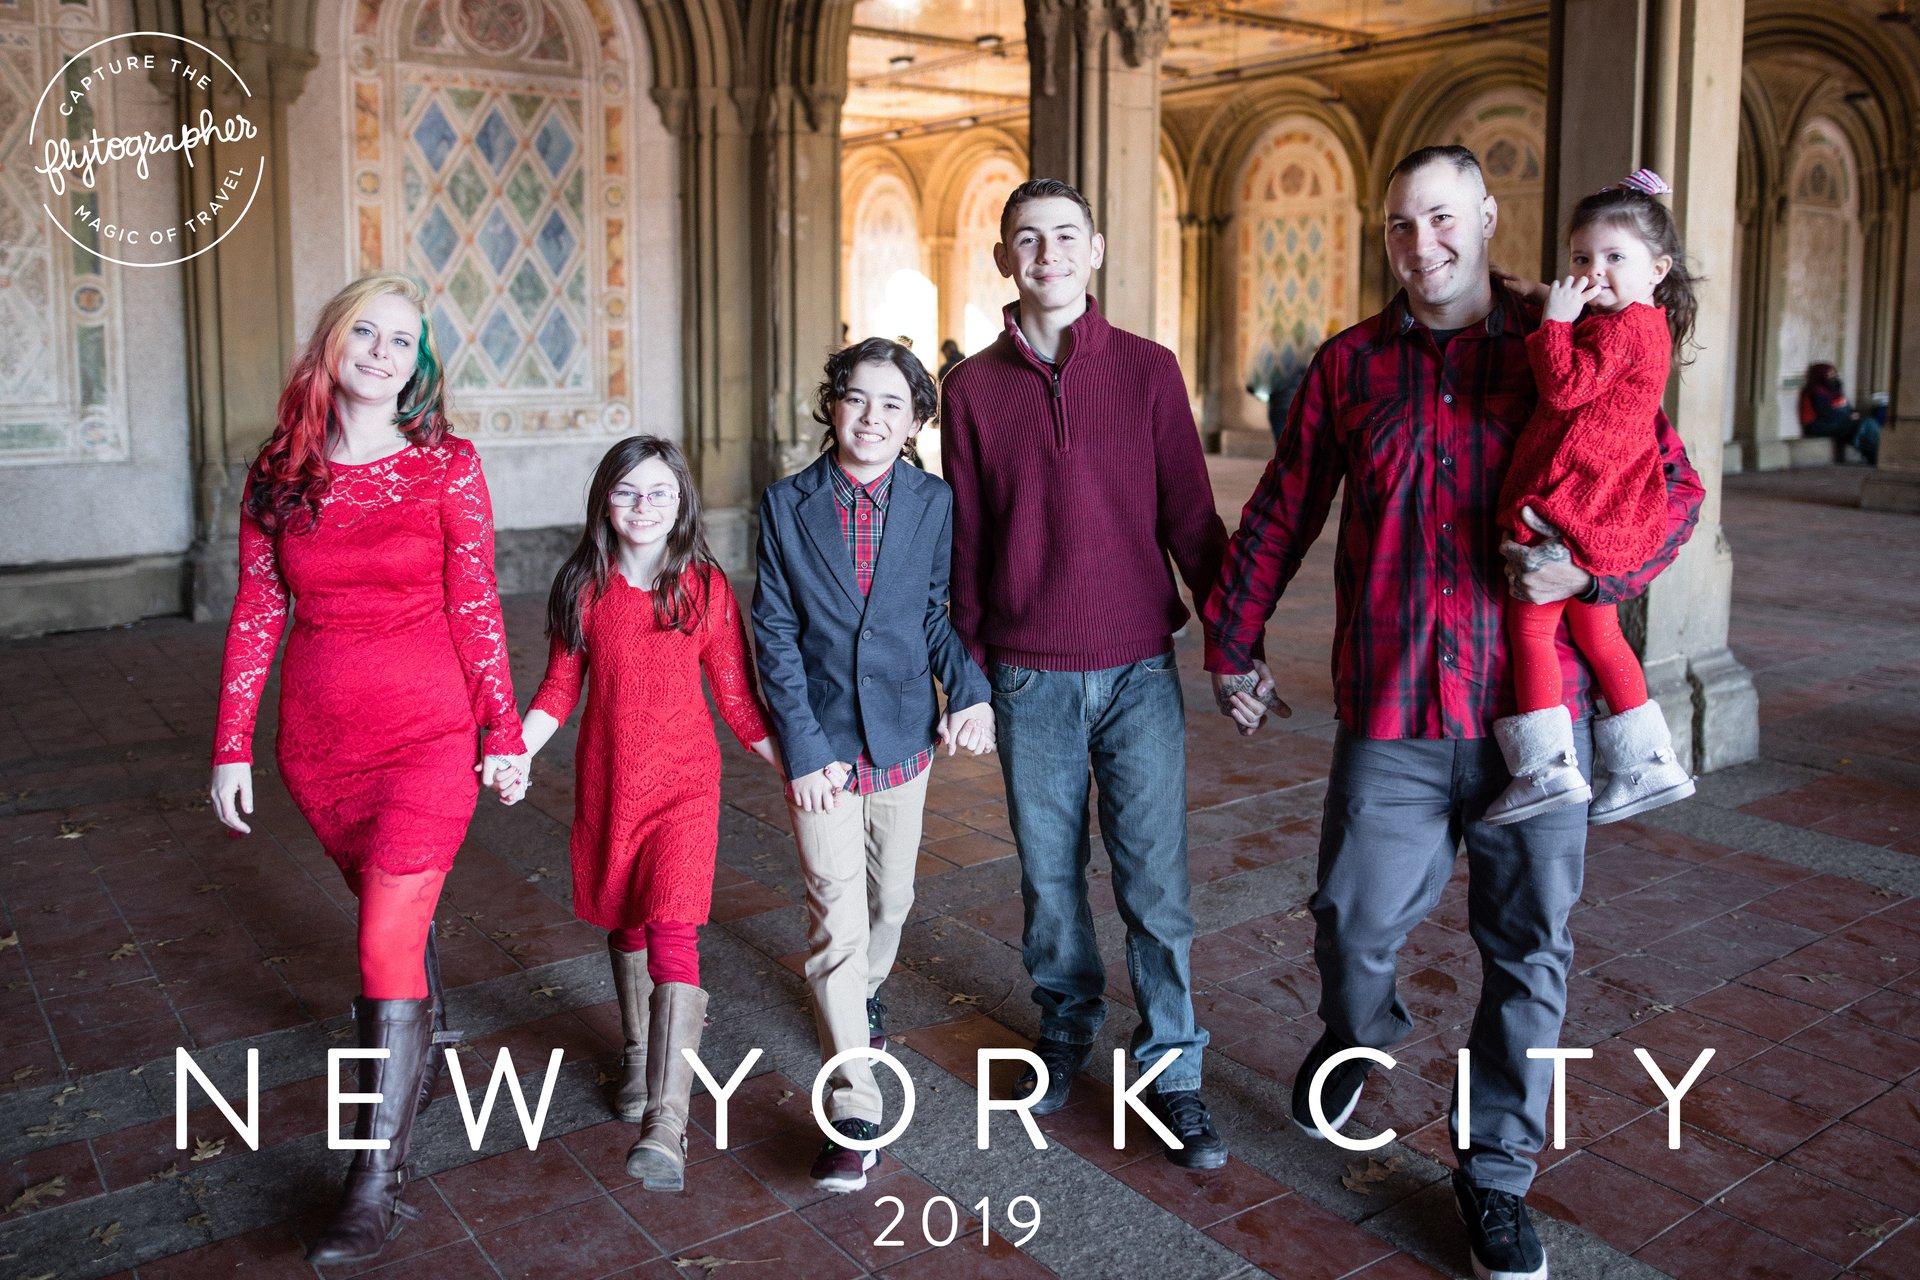 Flytographer Travel Story - Christmas in New York City